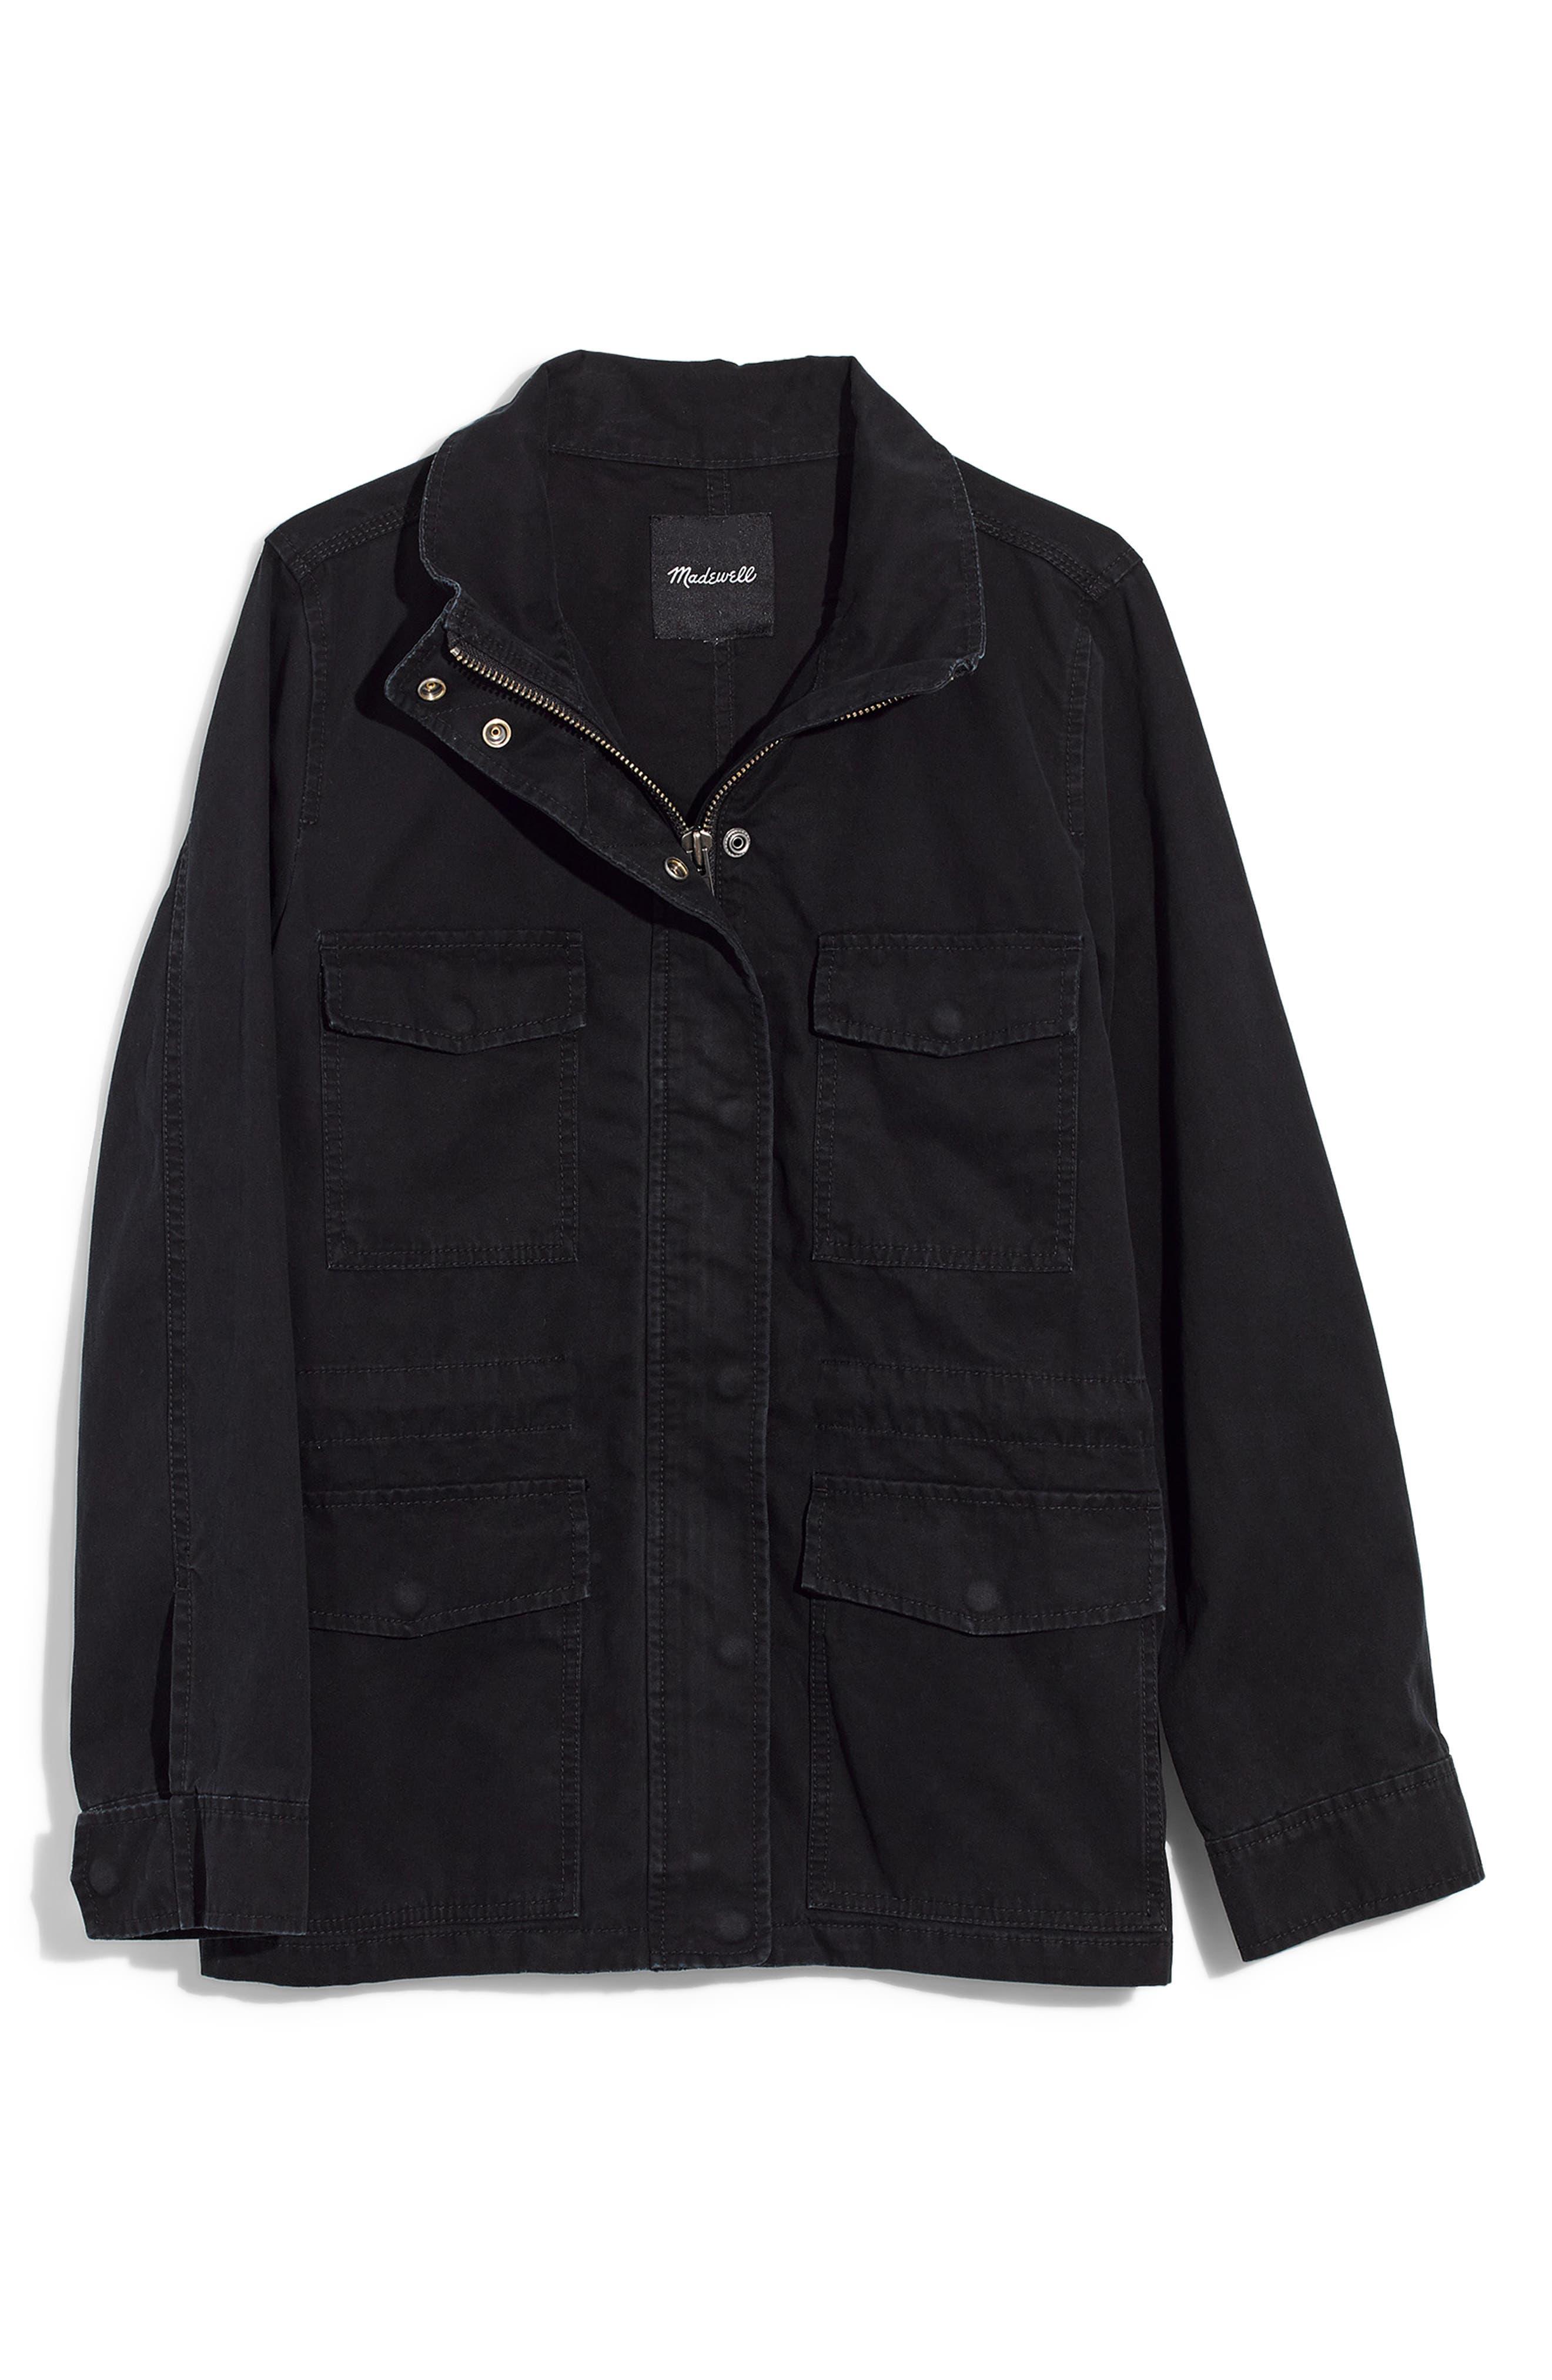 Surplus Jacket,                             Alternate thumbnail 5, color,                             TRUE BLACK